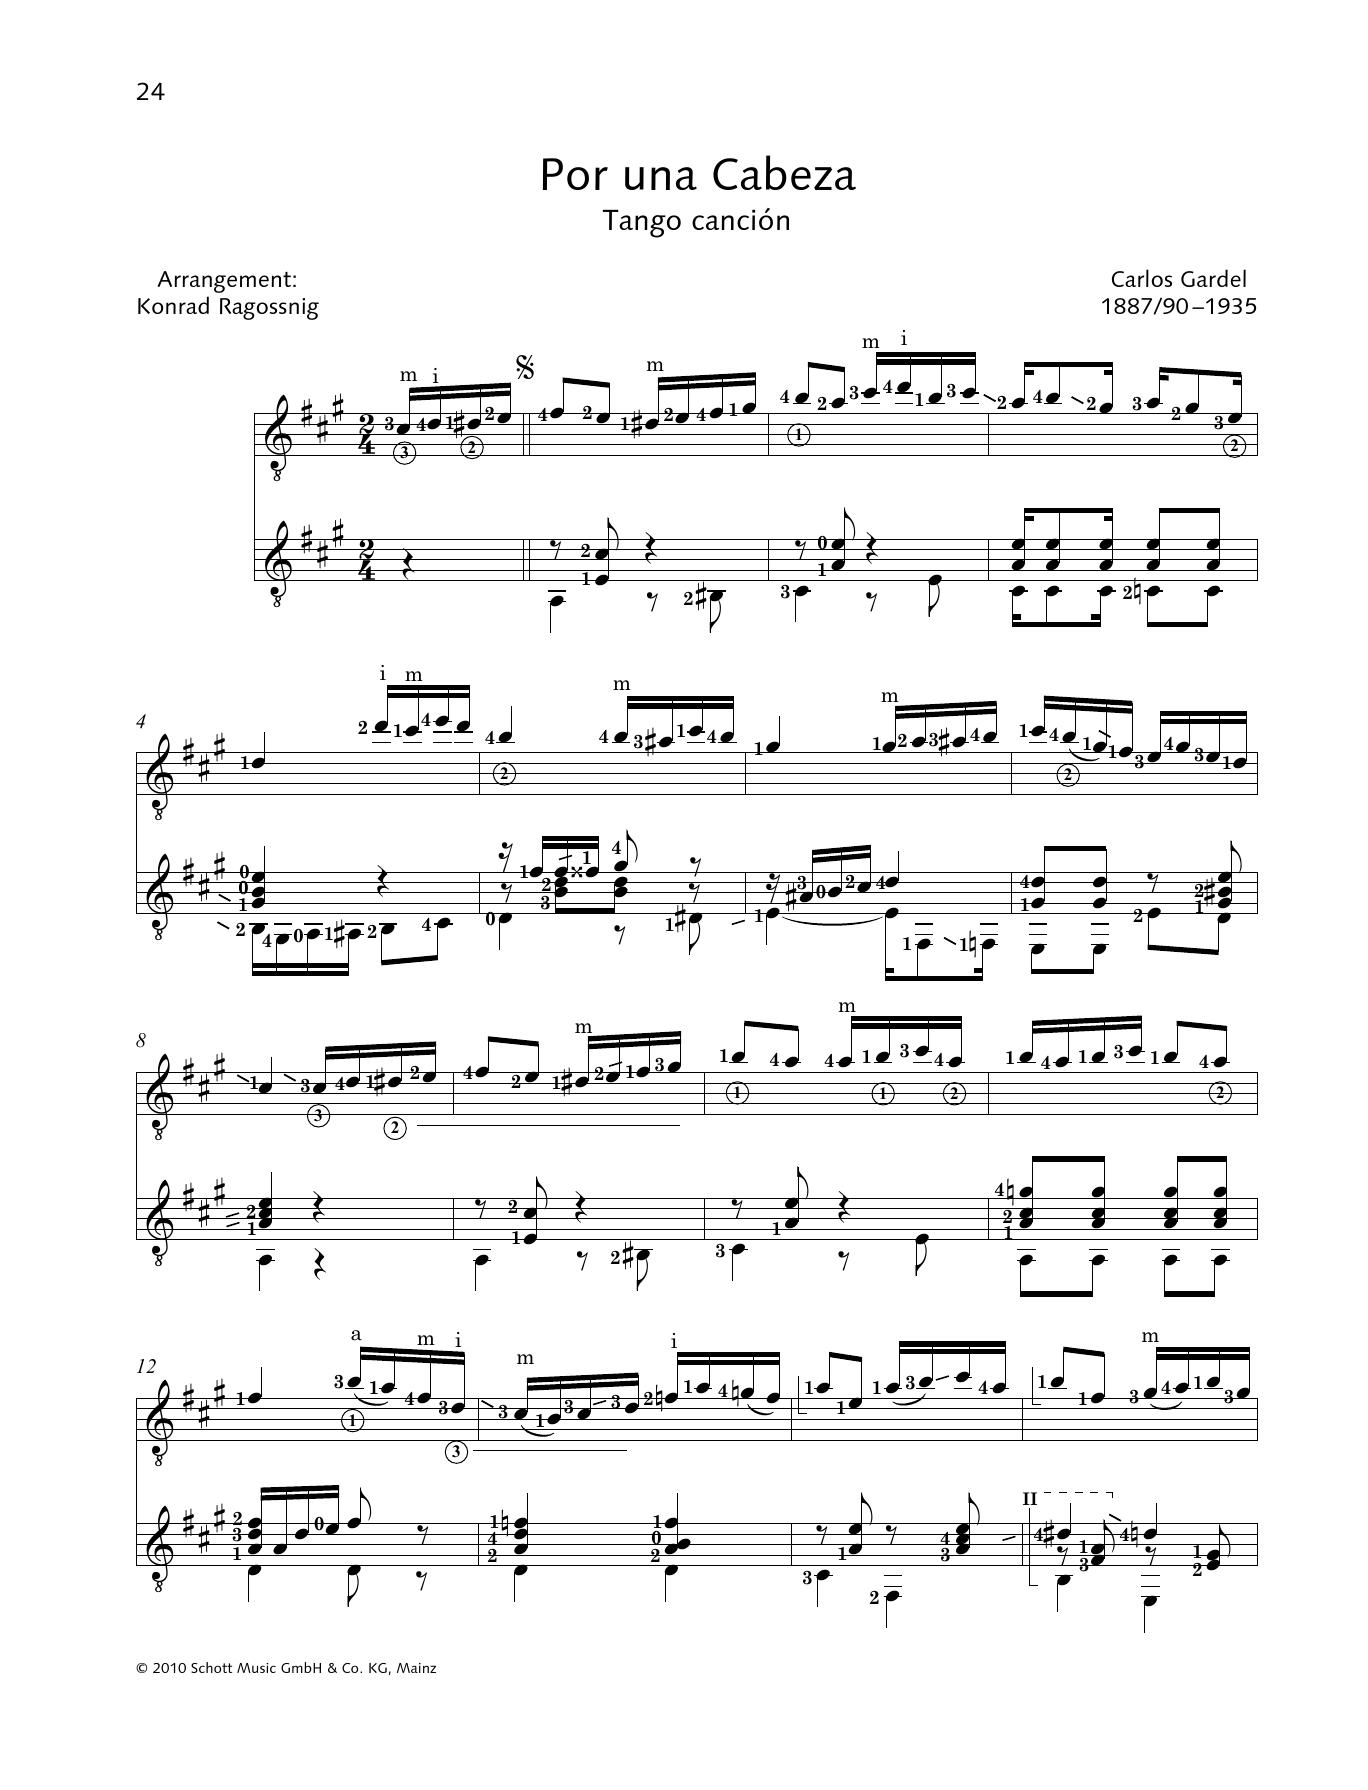 Carlos Gardel Por Una Cabeza - Full Score sheet music notes and chords. Download Printable PDF.